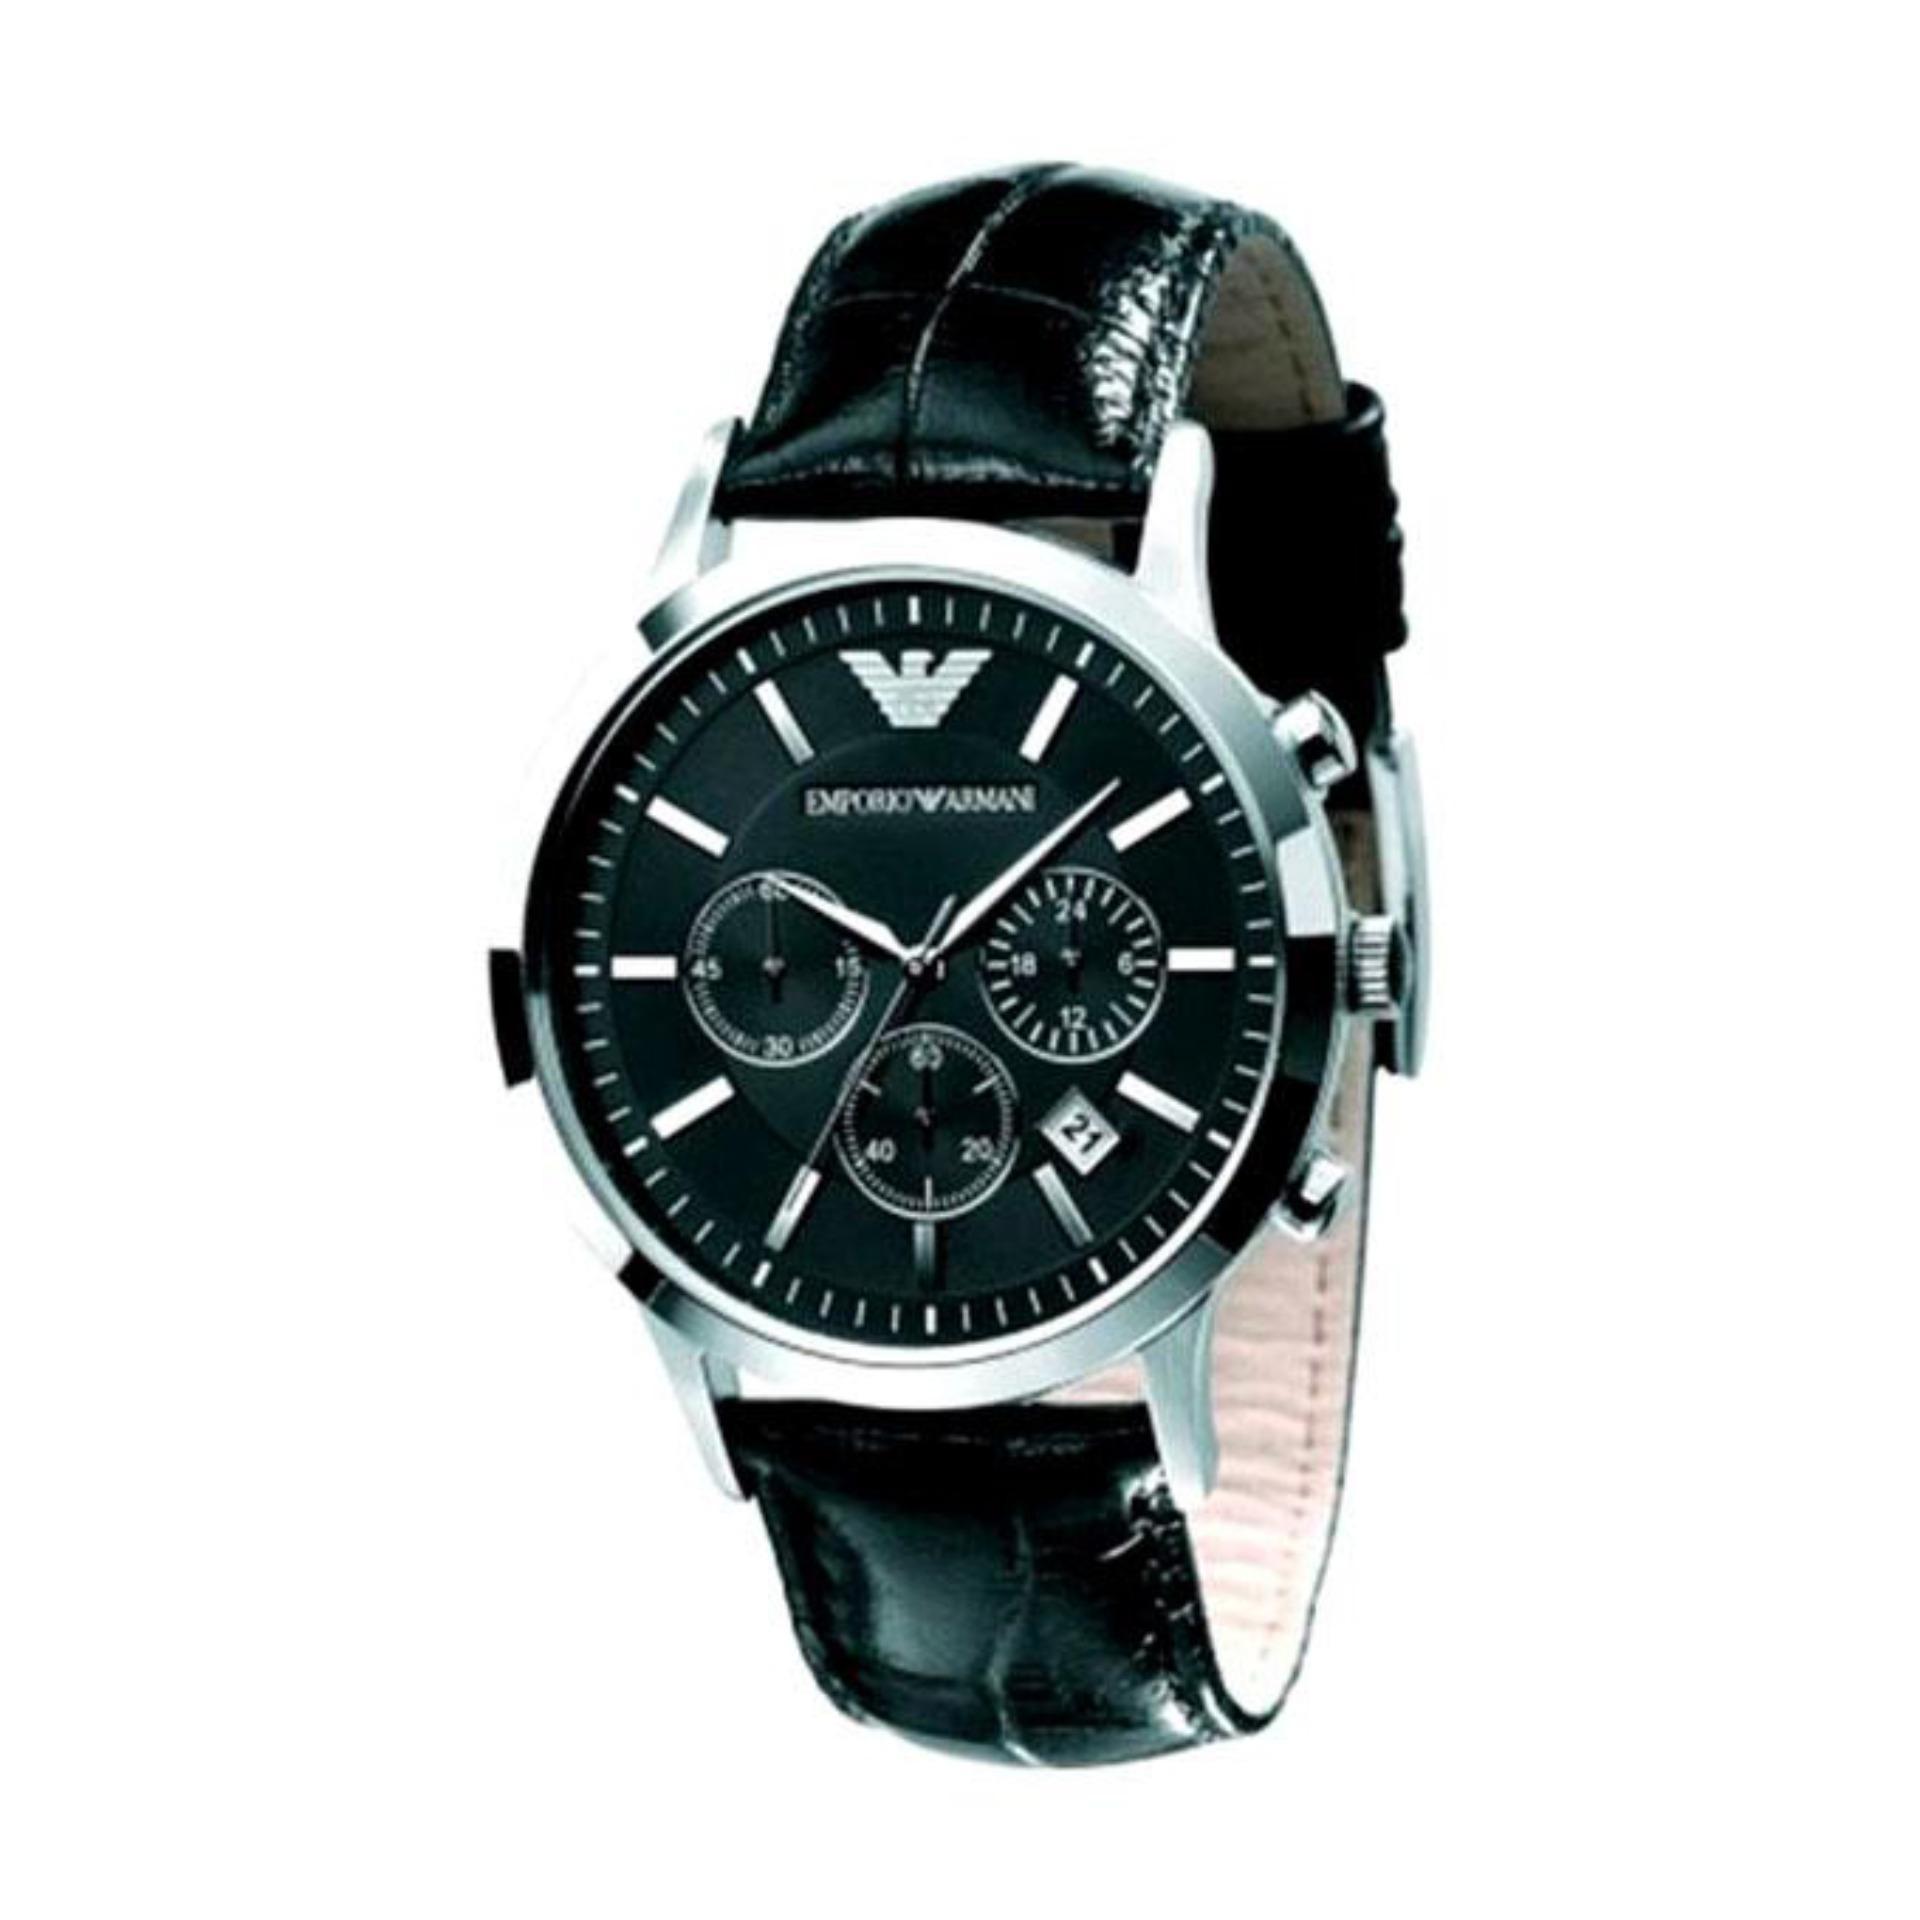 Leather AR2447 Analog Watch - Black